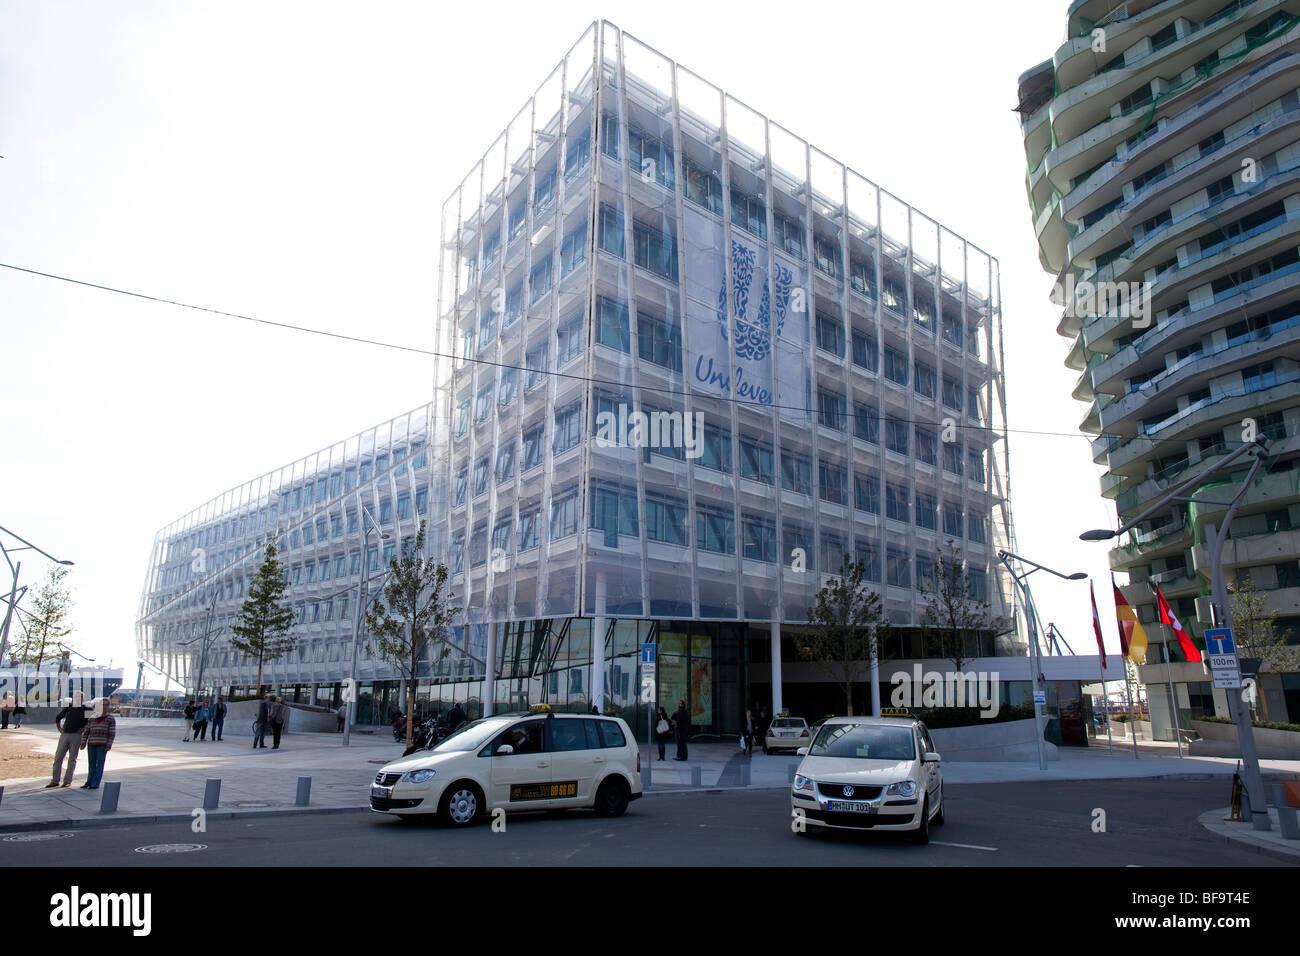 New Unilever European Headquarter in Hamburg, Germany - Stock Image